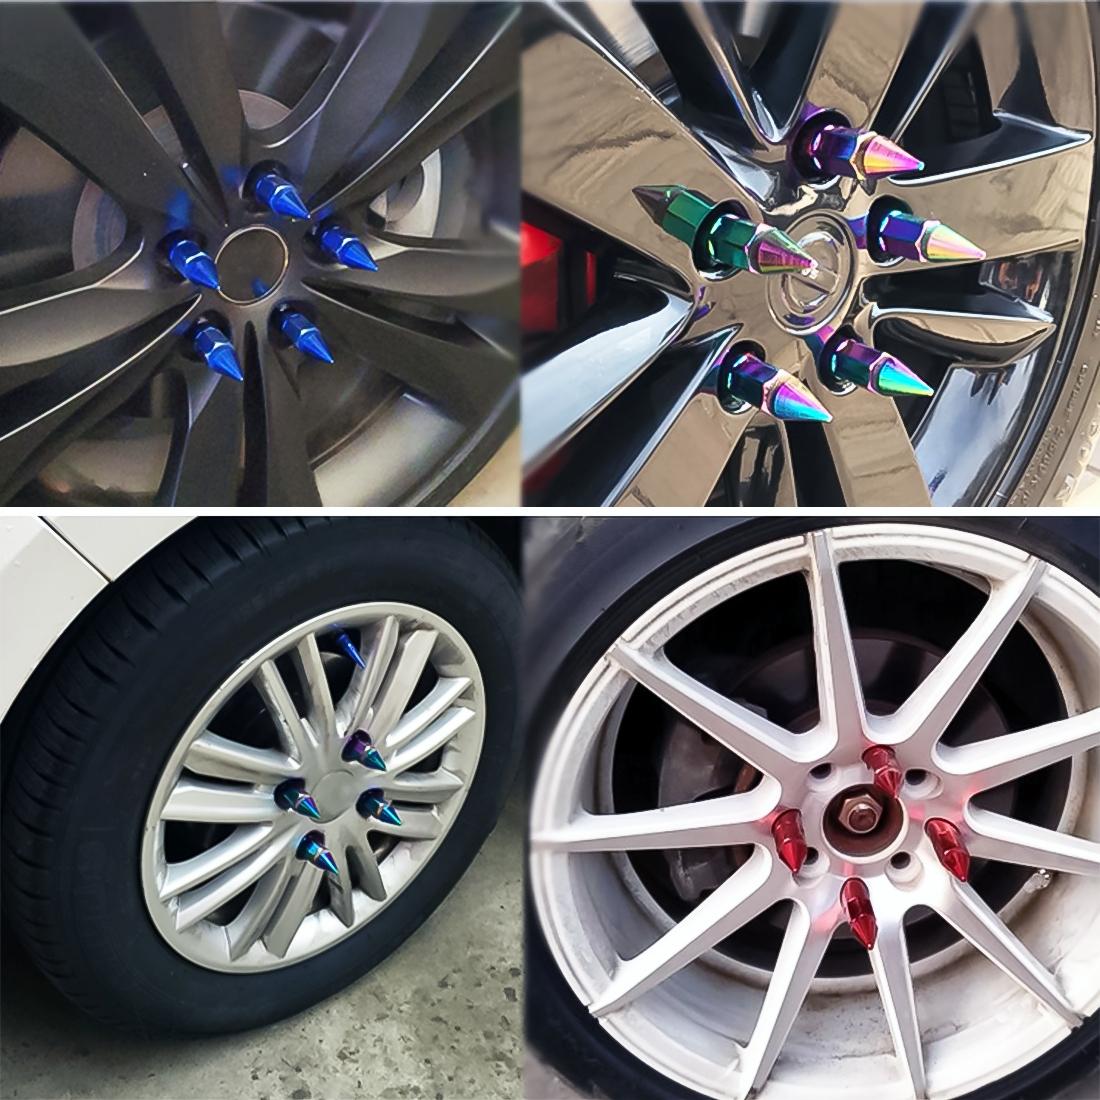 20 PCS Wheel Drive Hub Adaptor Car Wheel Nut Adjustable Decorative Steering Wheel Hub Nut